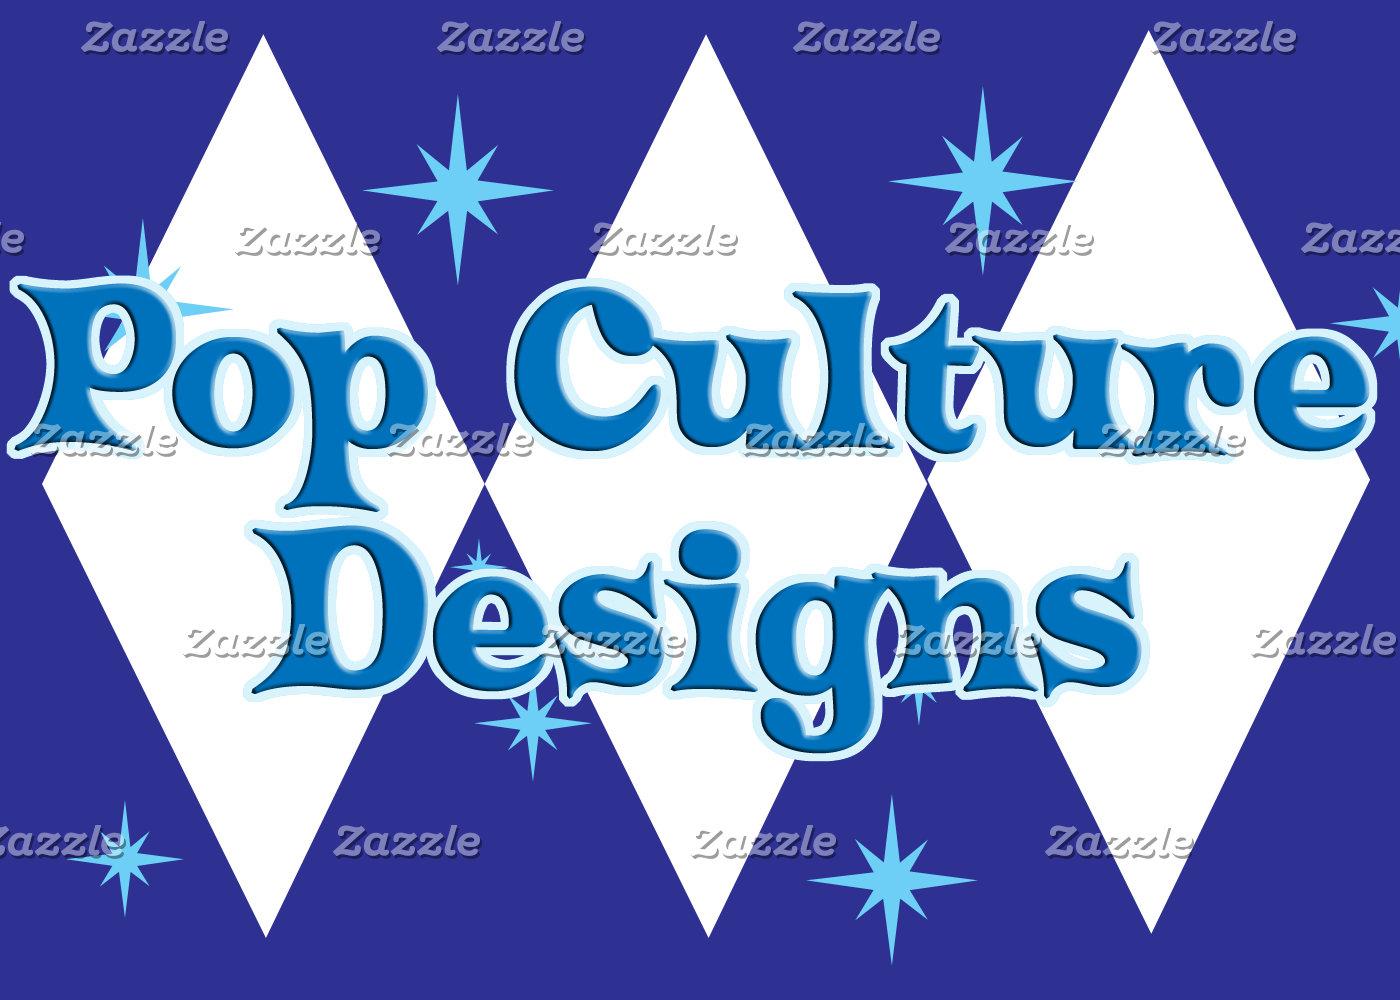 Pop Culture sayings